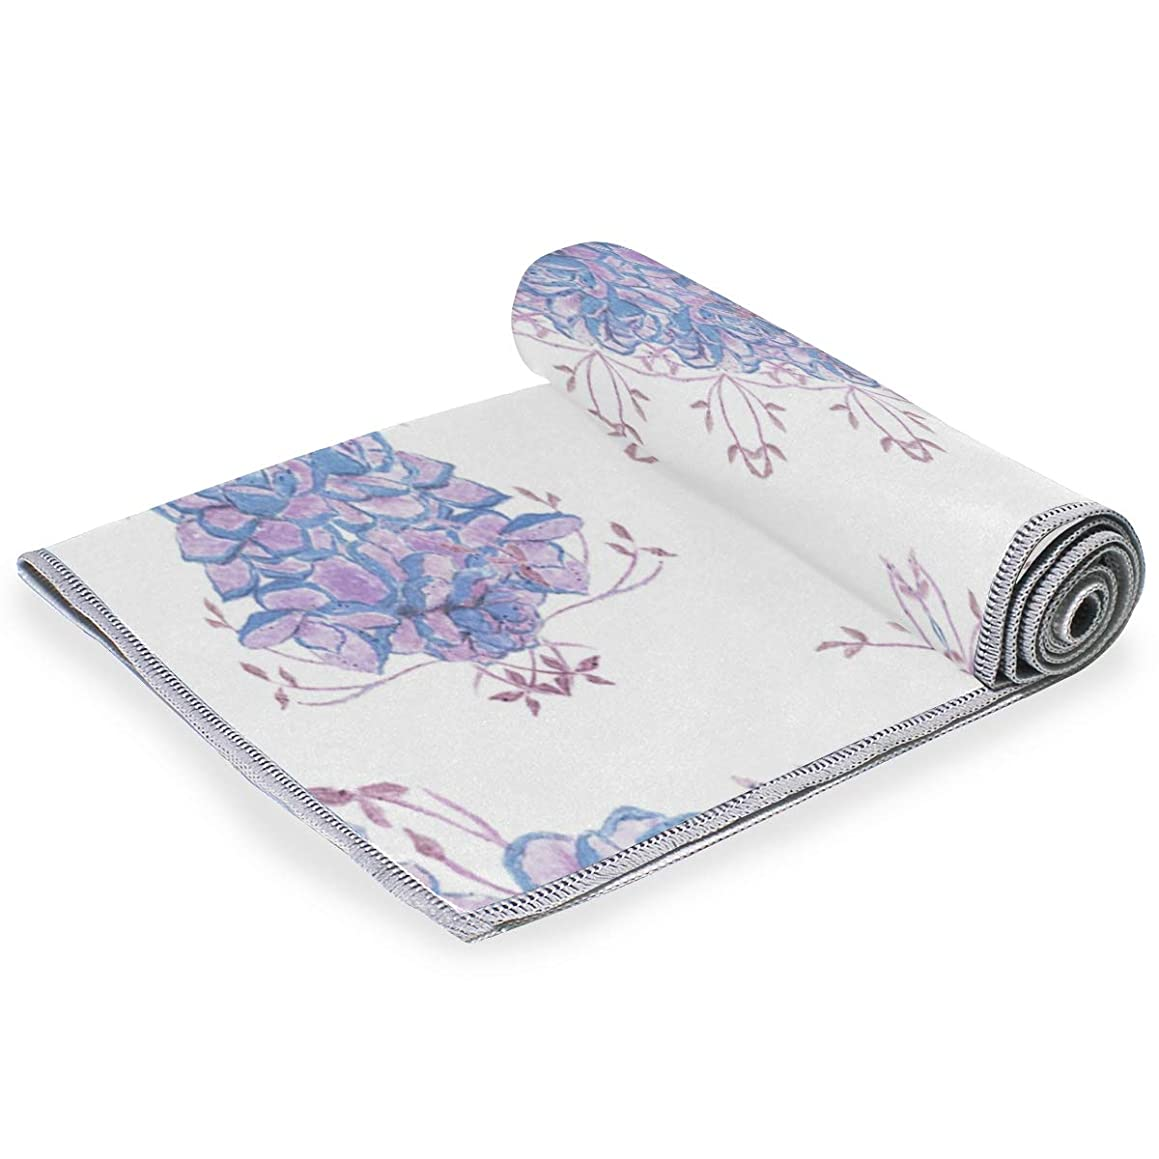 MALPLENA Blue Pink Floral Fade-Resistant Hand Towel Utopia Towels